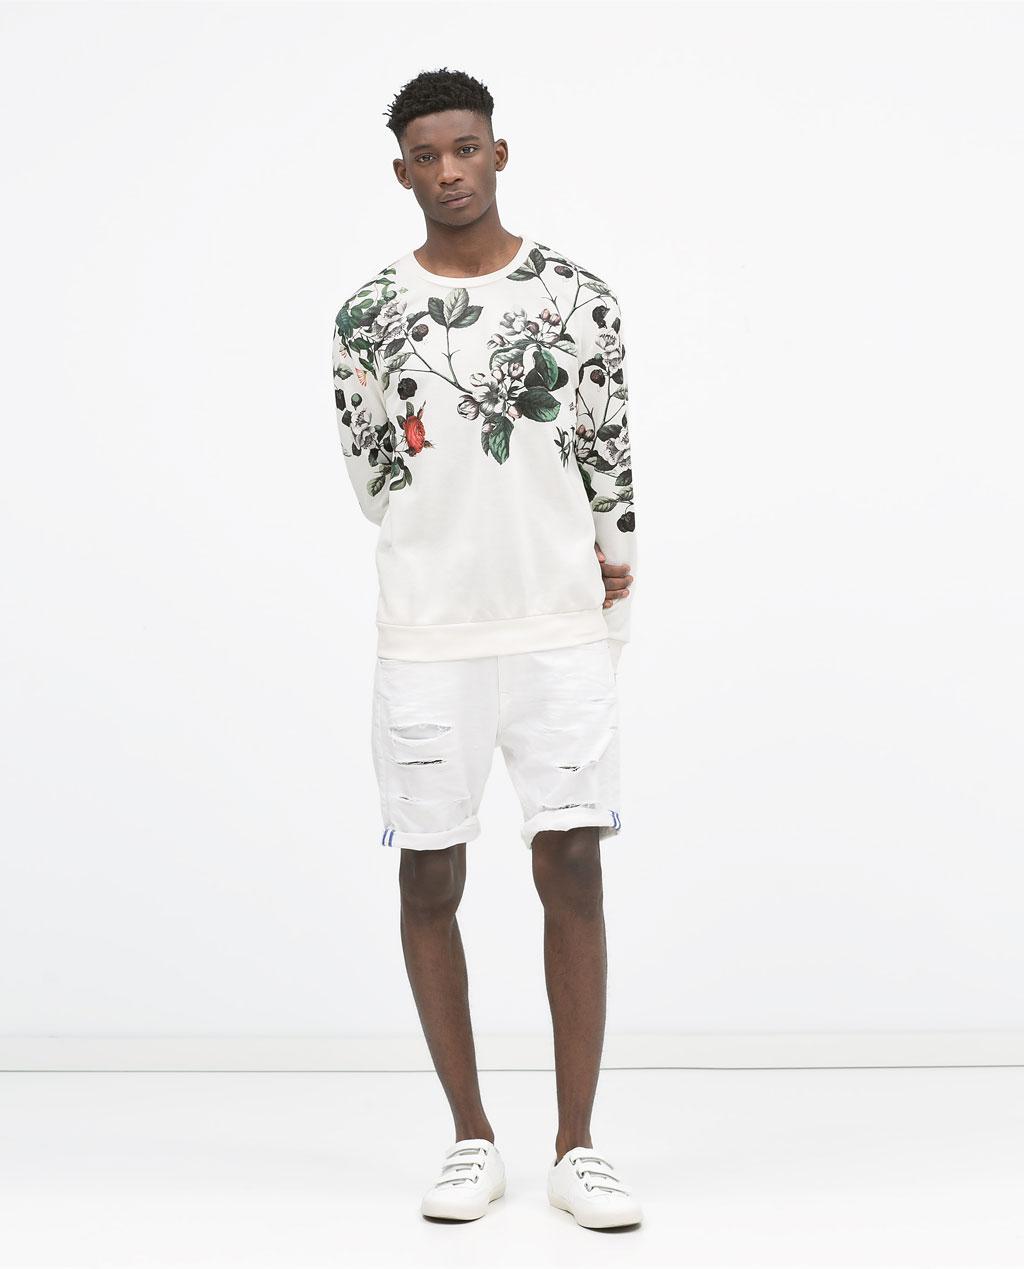 Lookbook: Harry Uzoka For Zara – dmfashionbook.com